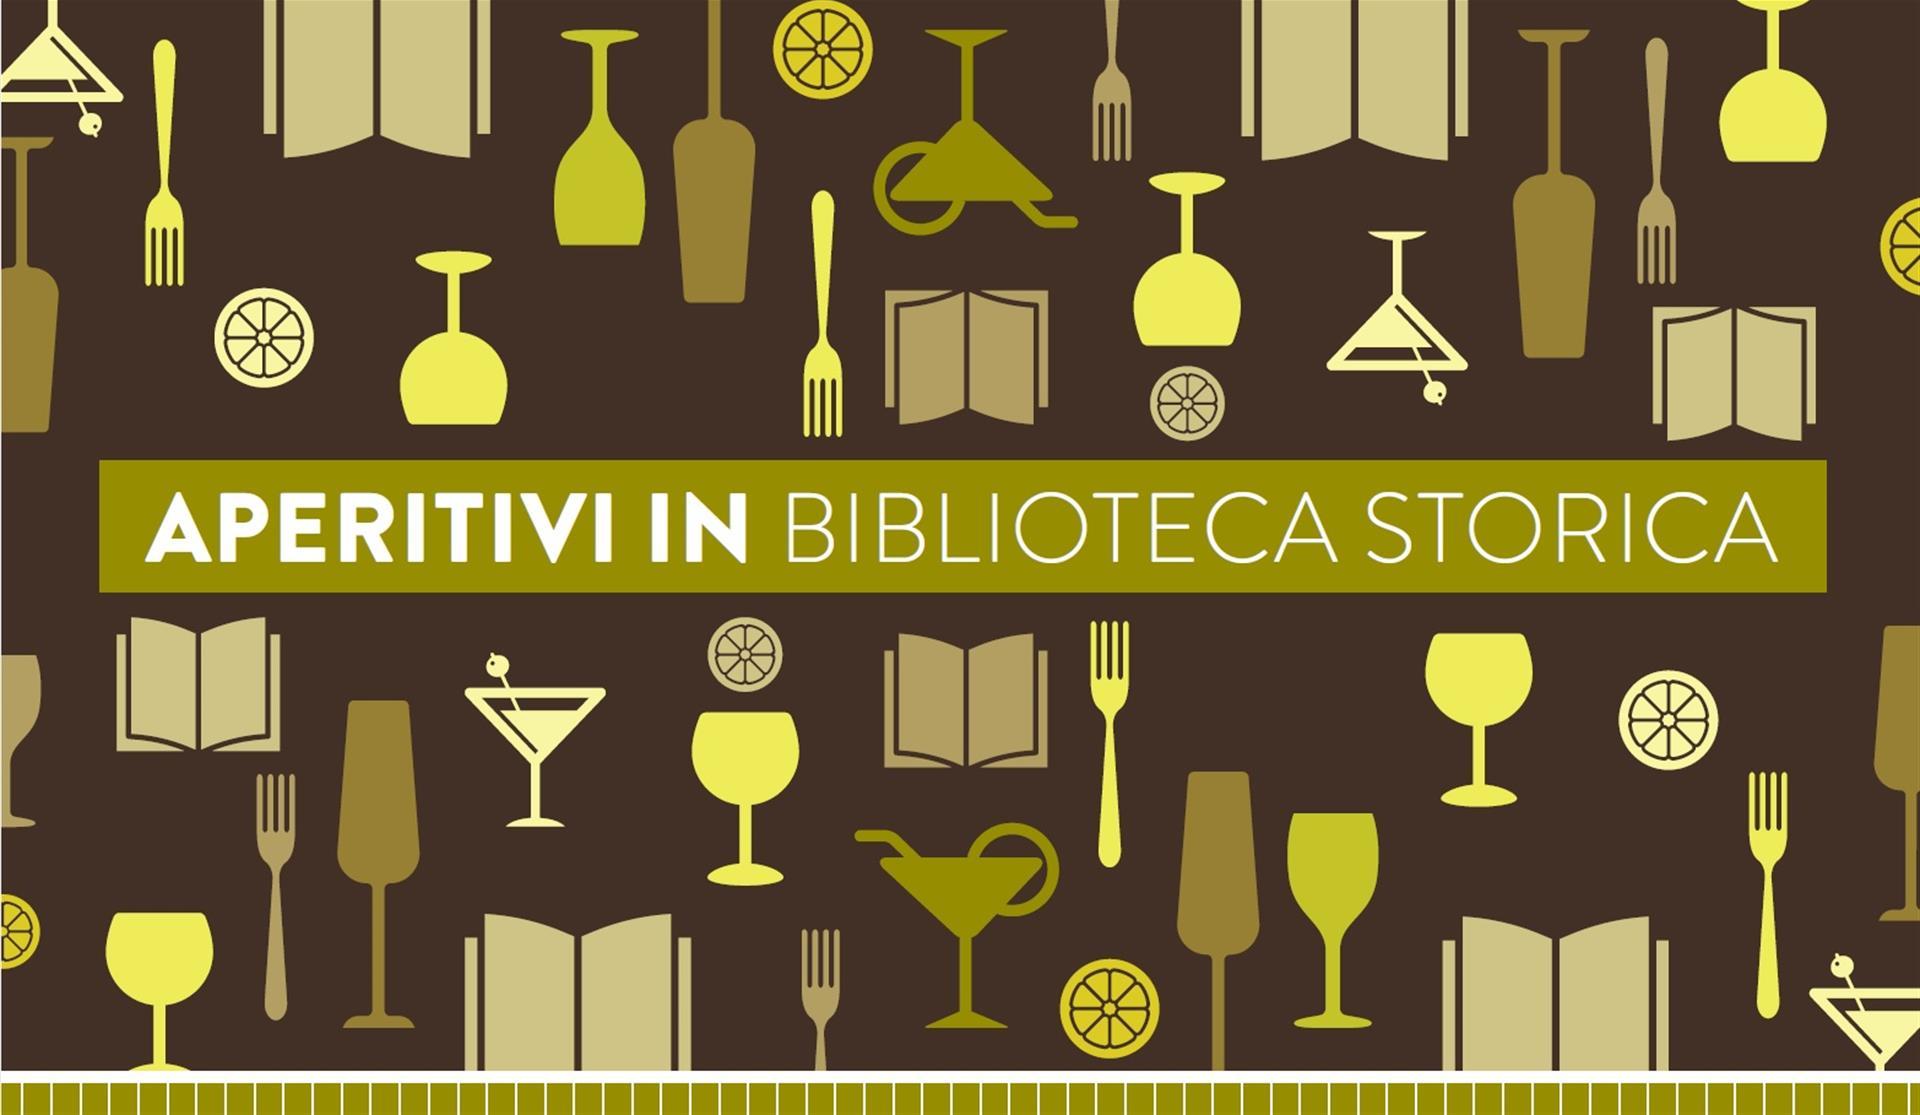 Aperitivi Biblioteca Storica Rassegna Page 0001